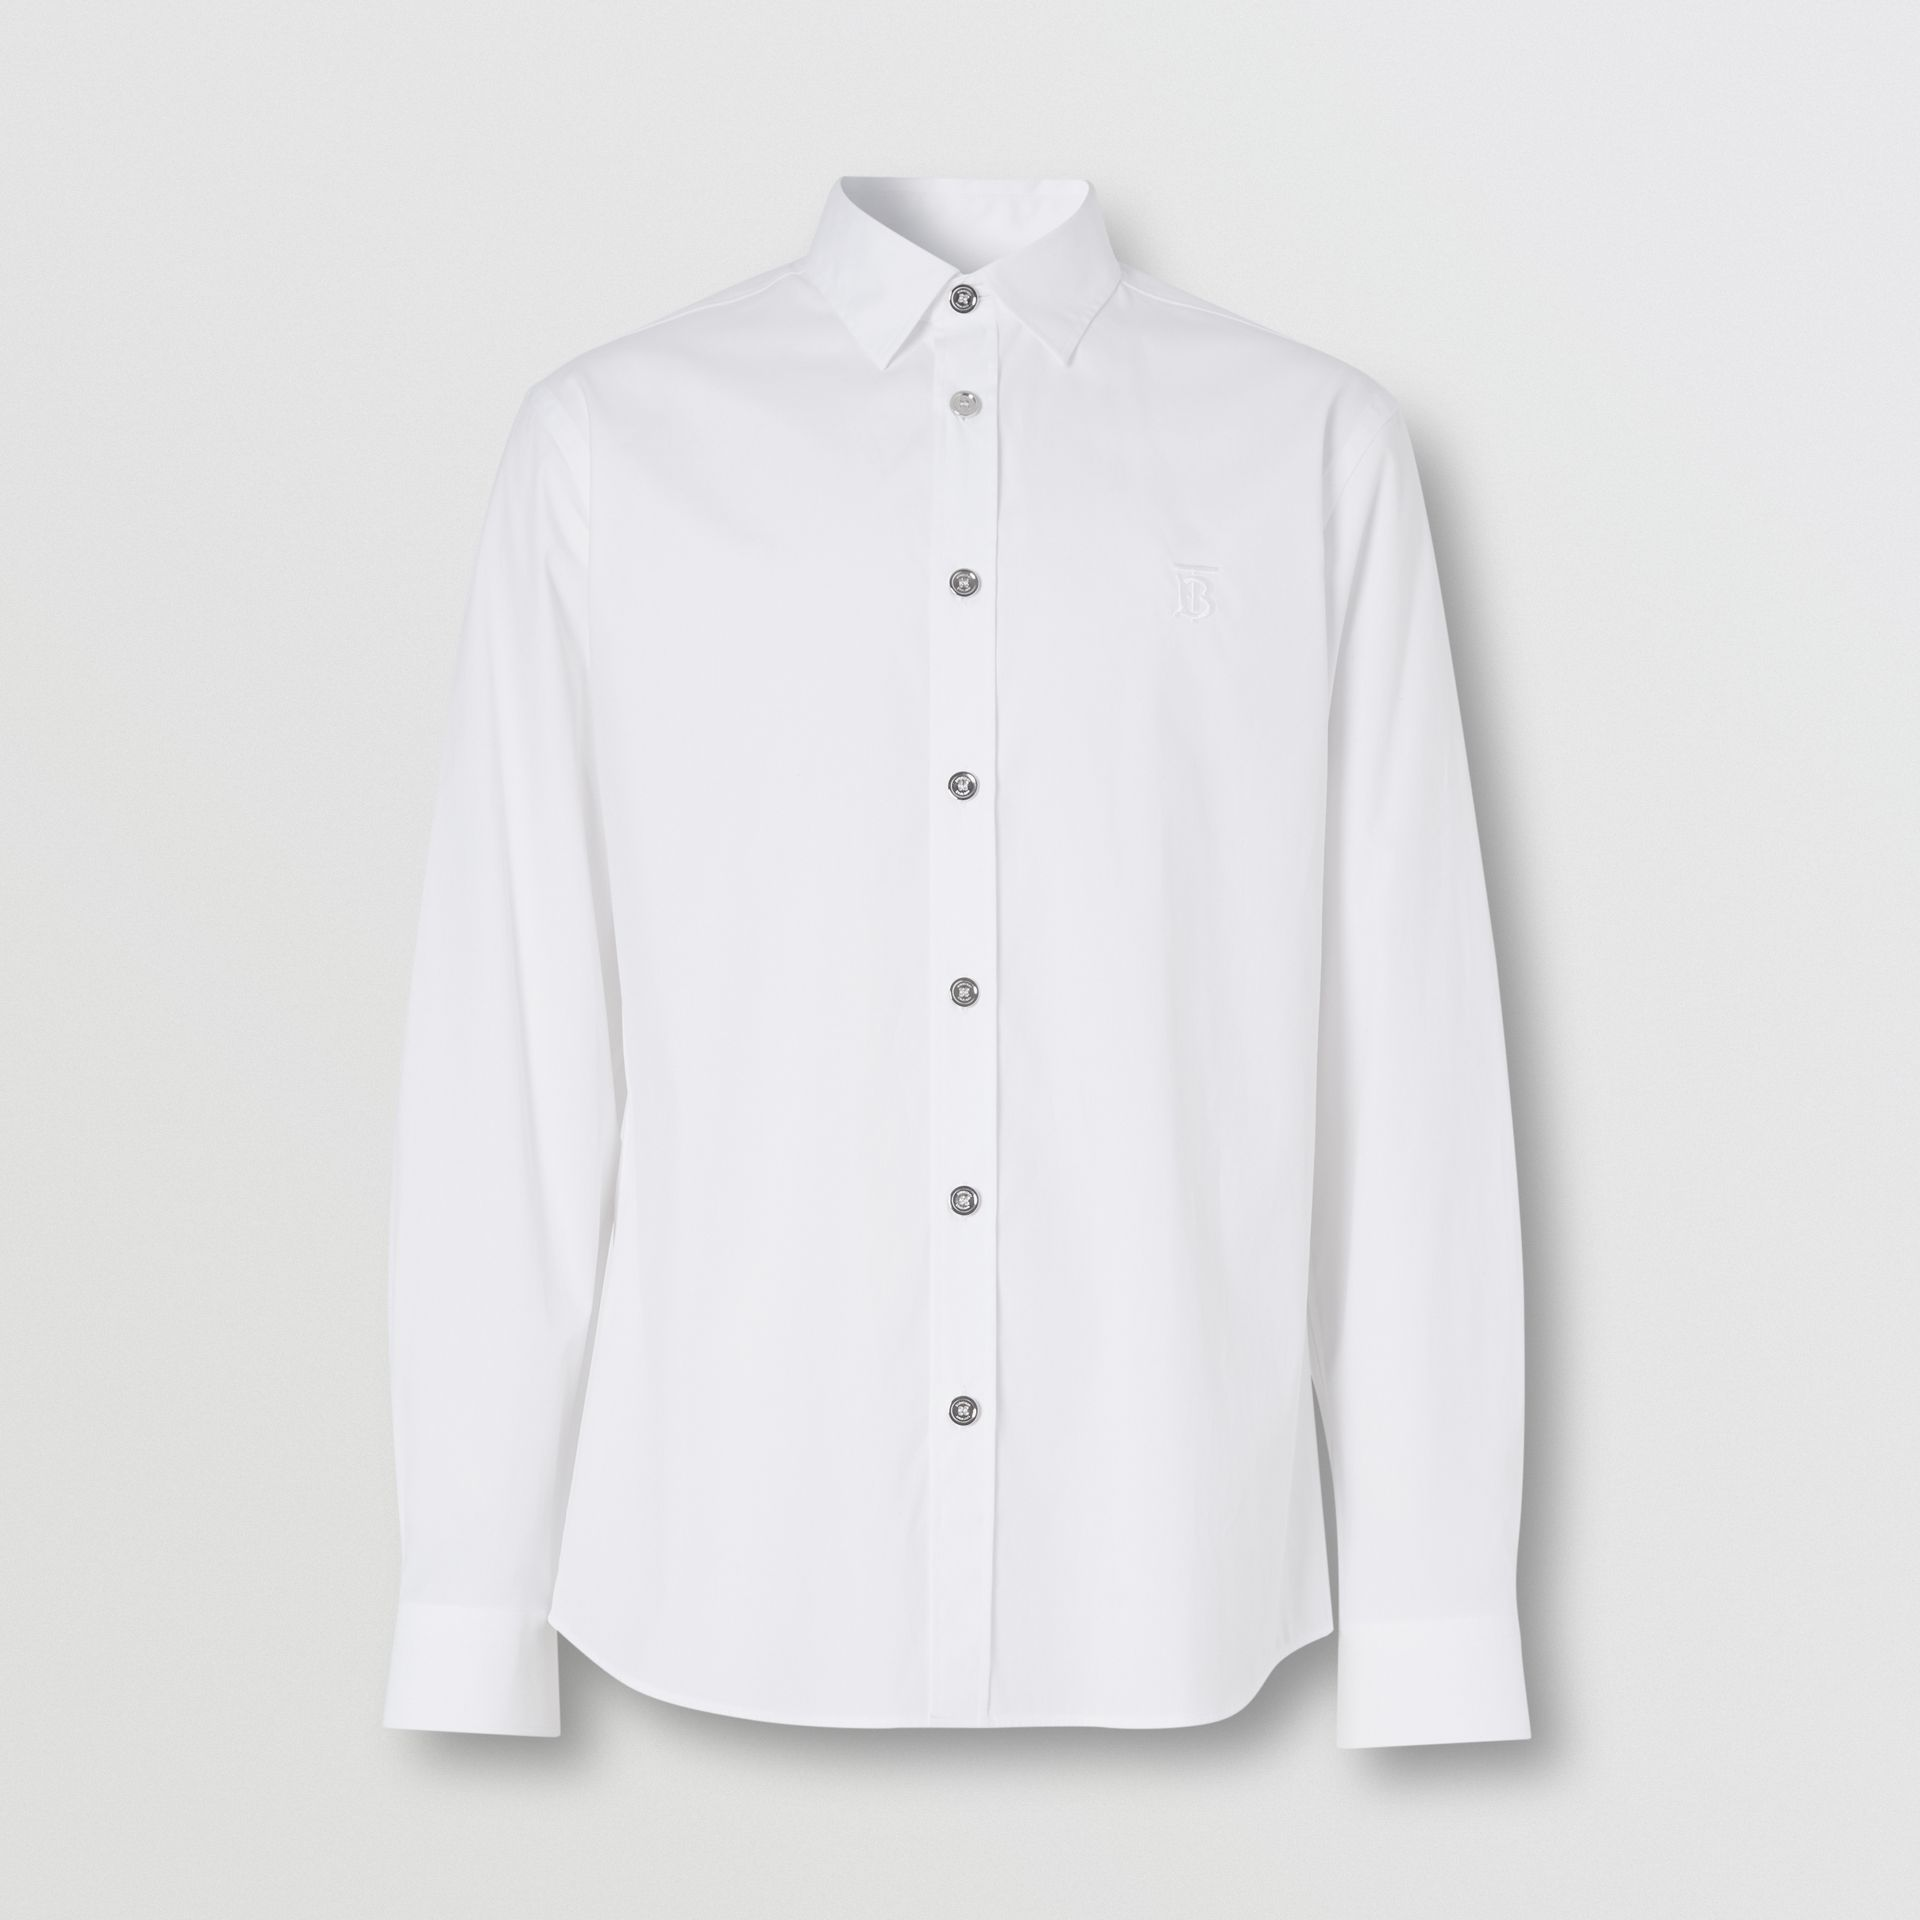 Monogram Motif Stretch Cotton Poplin Shirt in White - Men | Burberry United Kingdom - gallery image 3